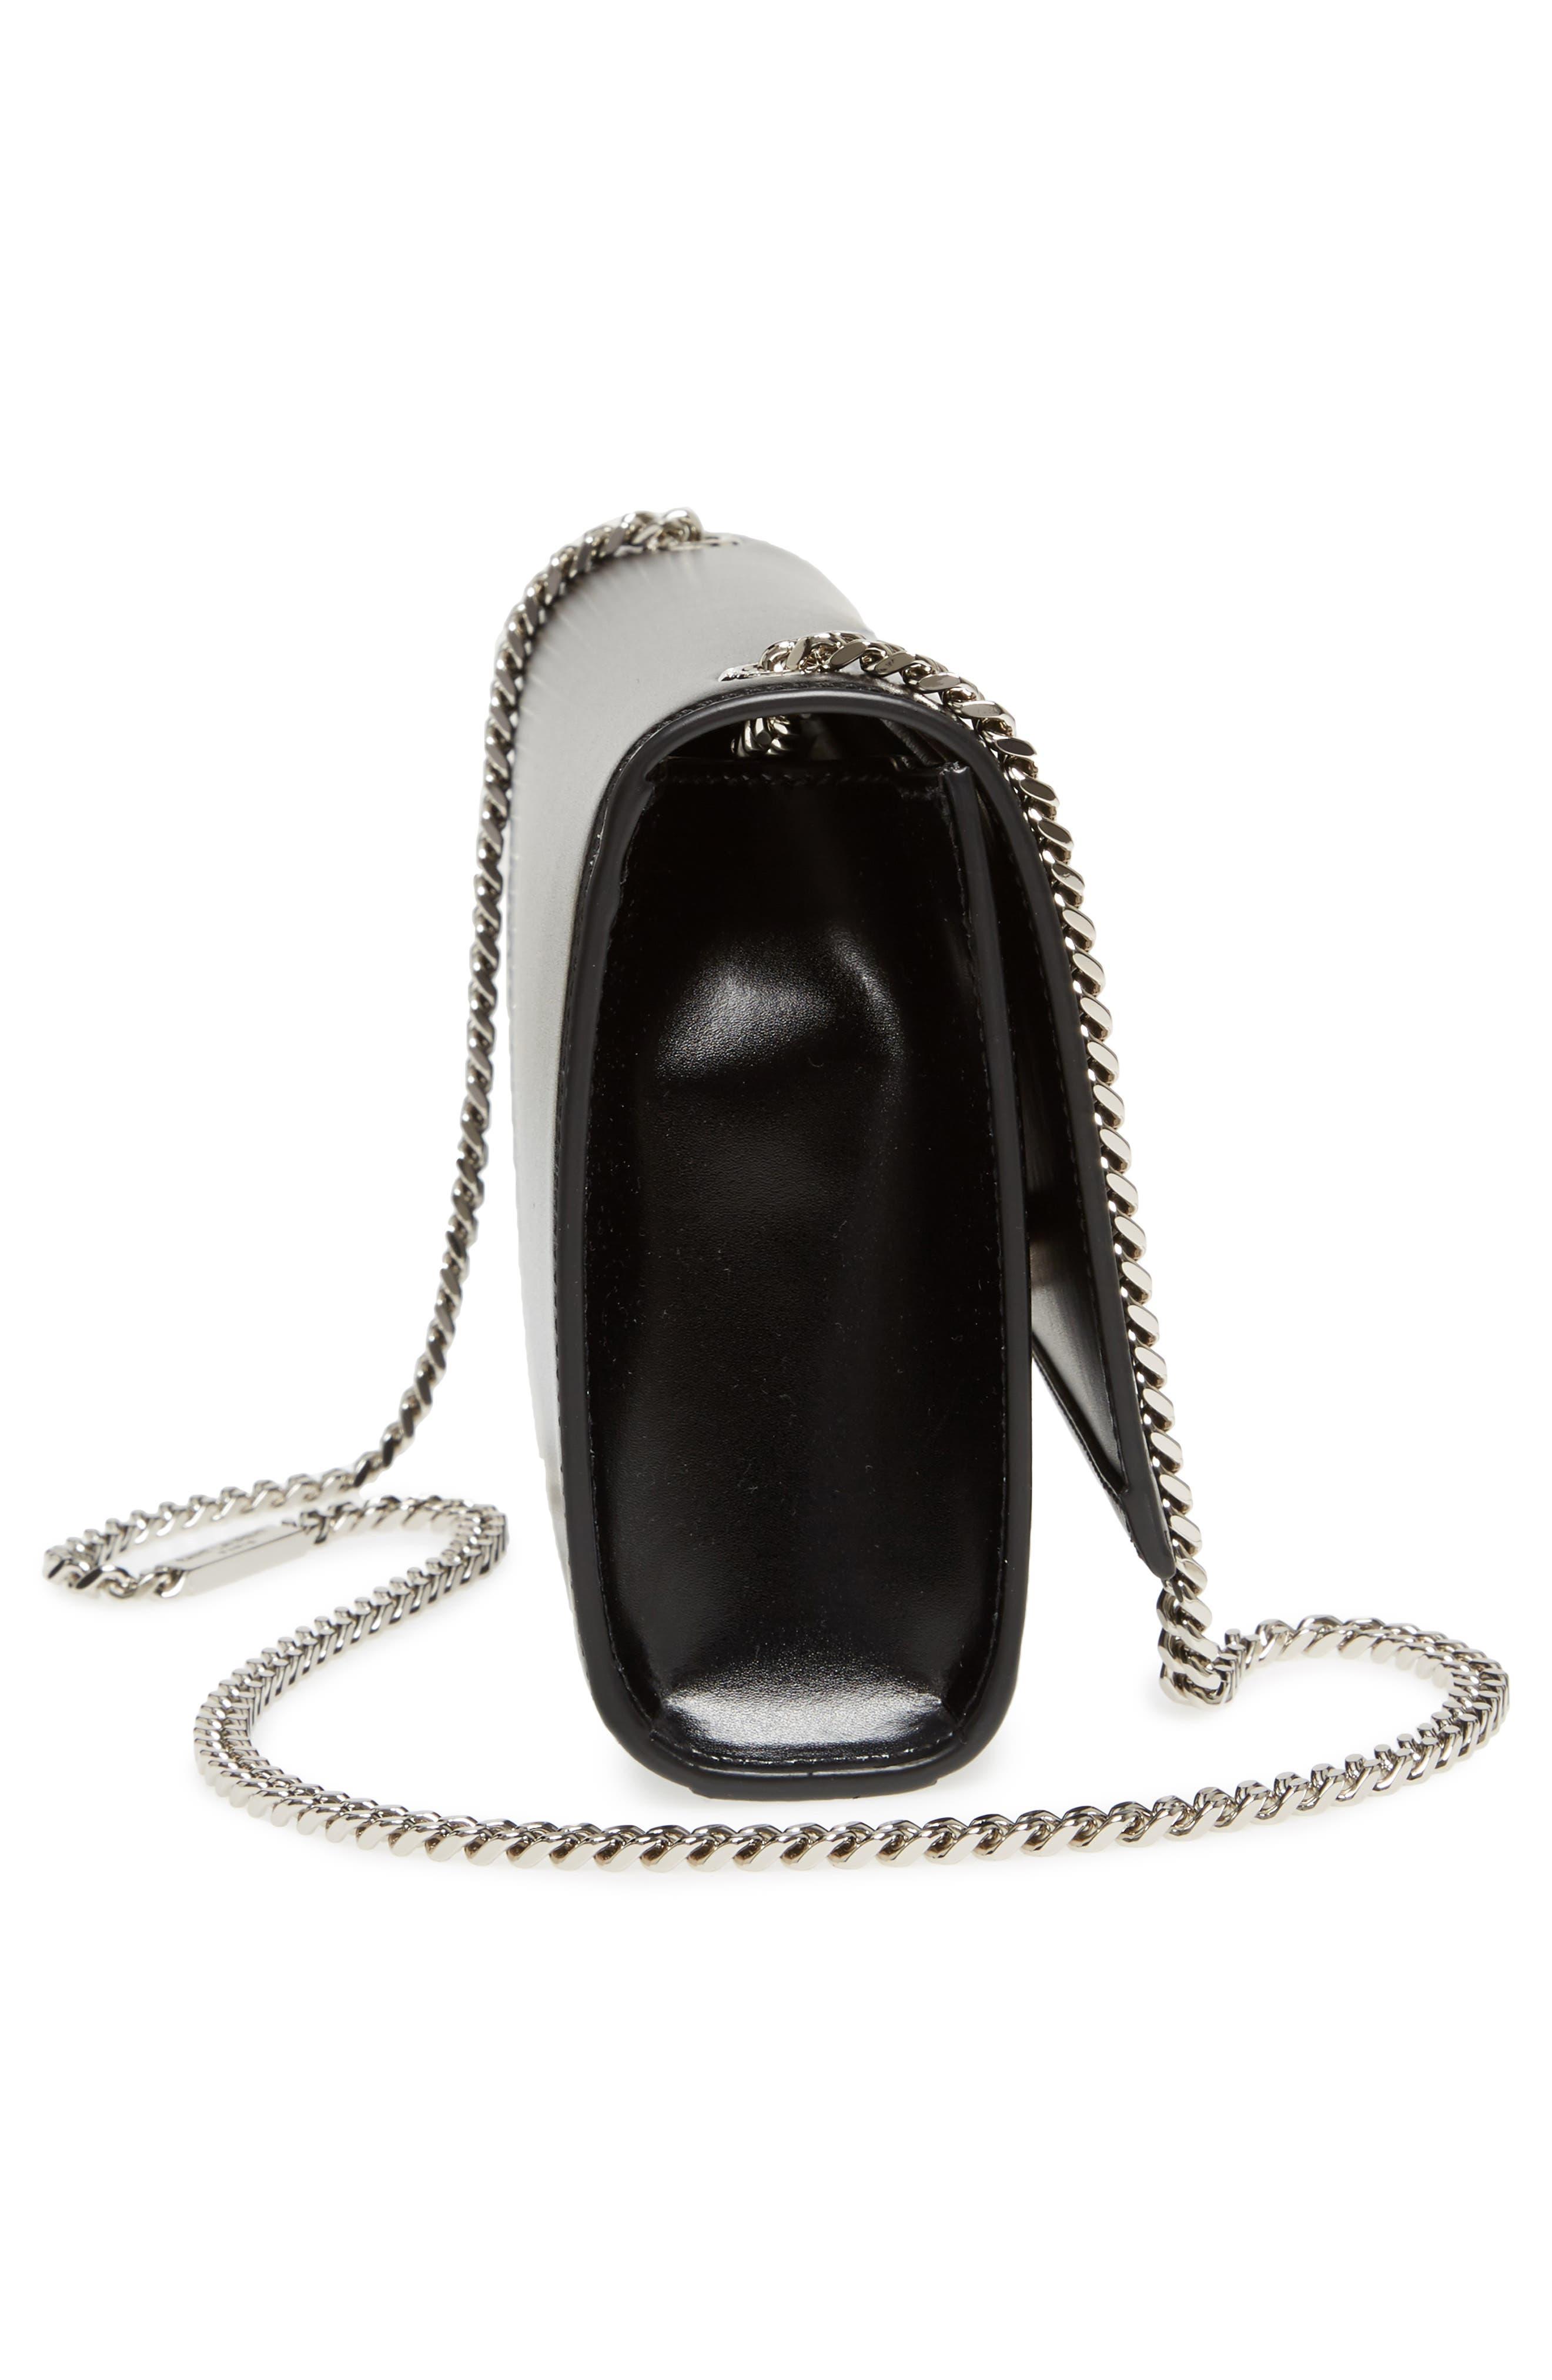 Medium Kate Calfskin Leather Crossbody Bag,                             Alternate thumbnail 5, color,                             001